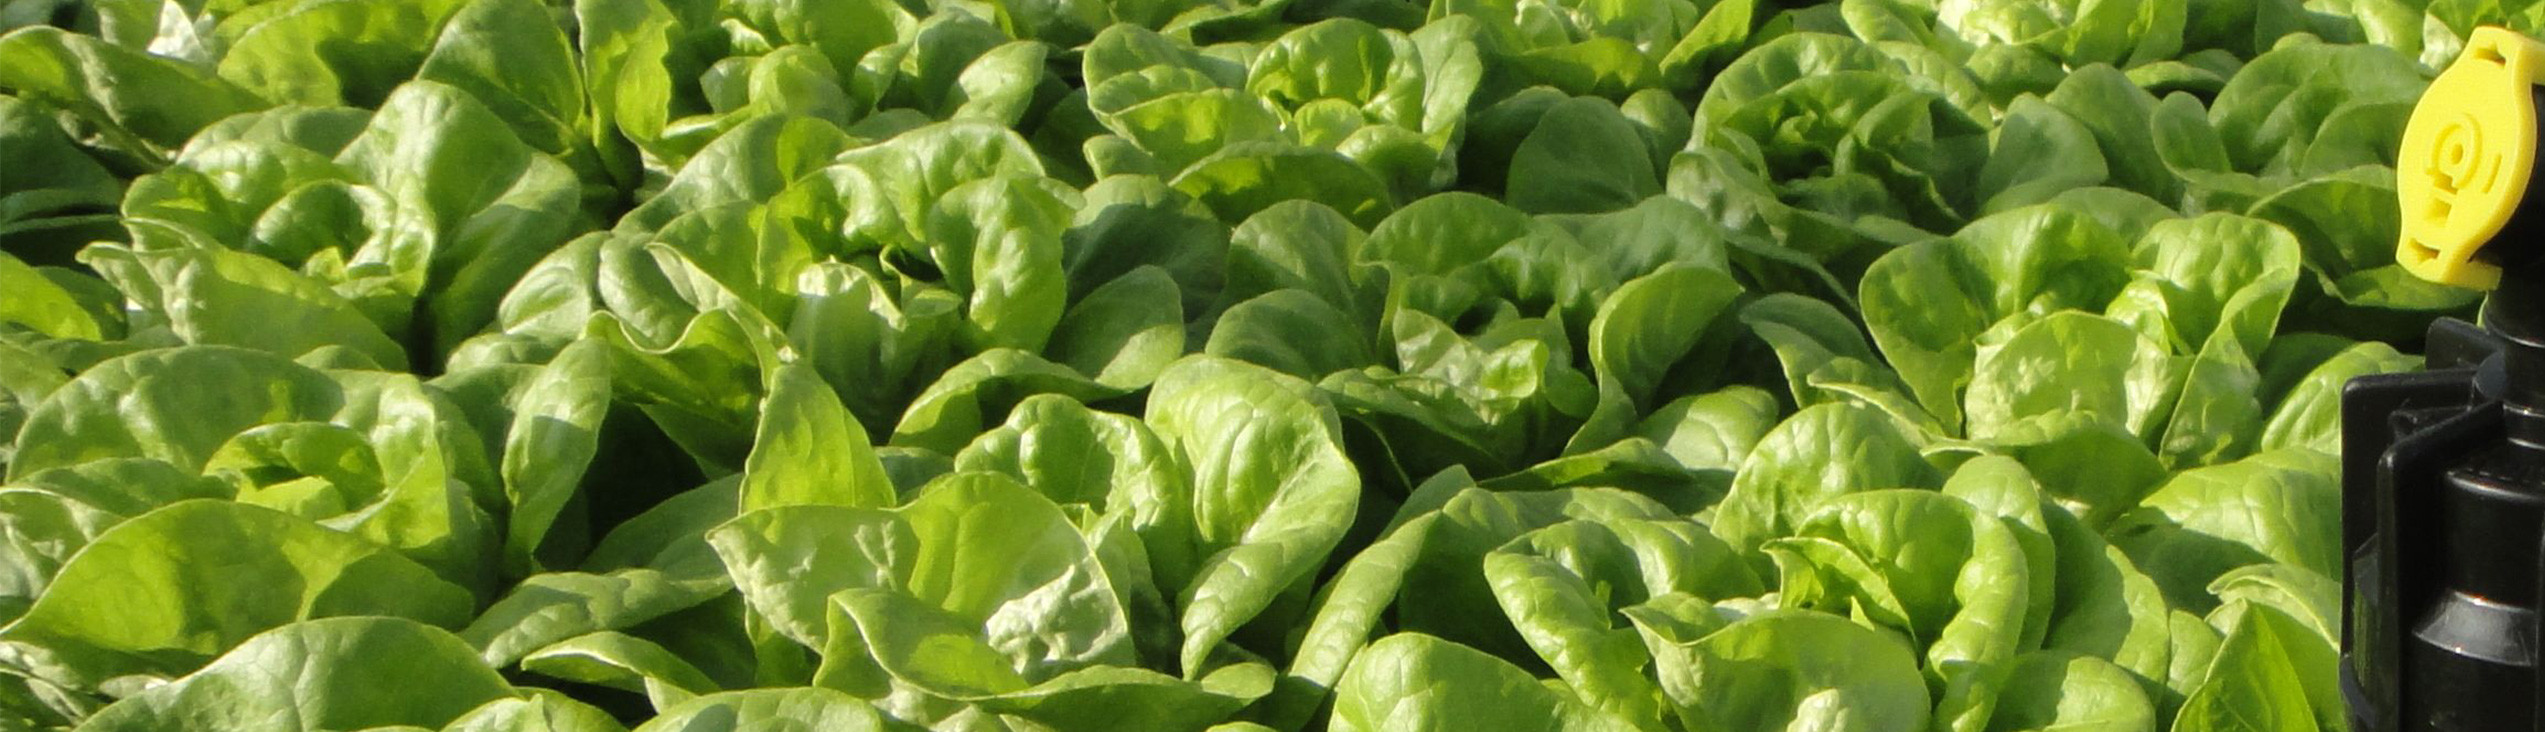 Kopfsalate präzise bewässern mit Green Fox Service AG